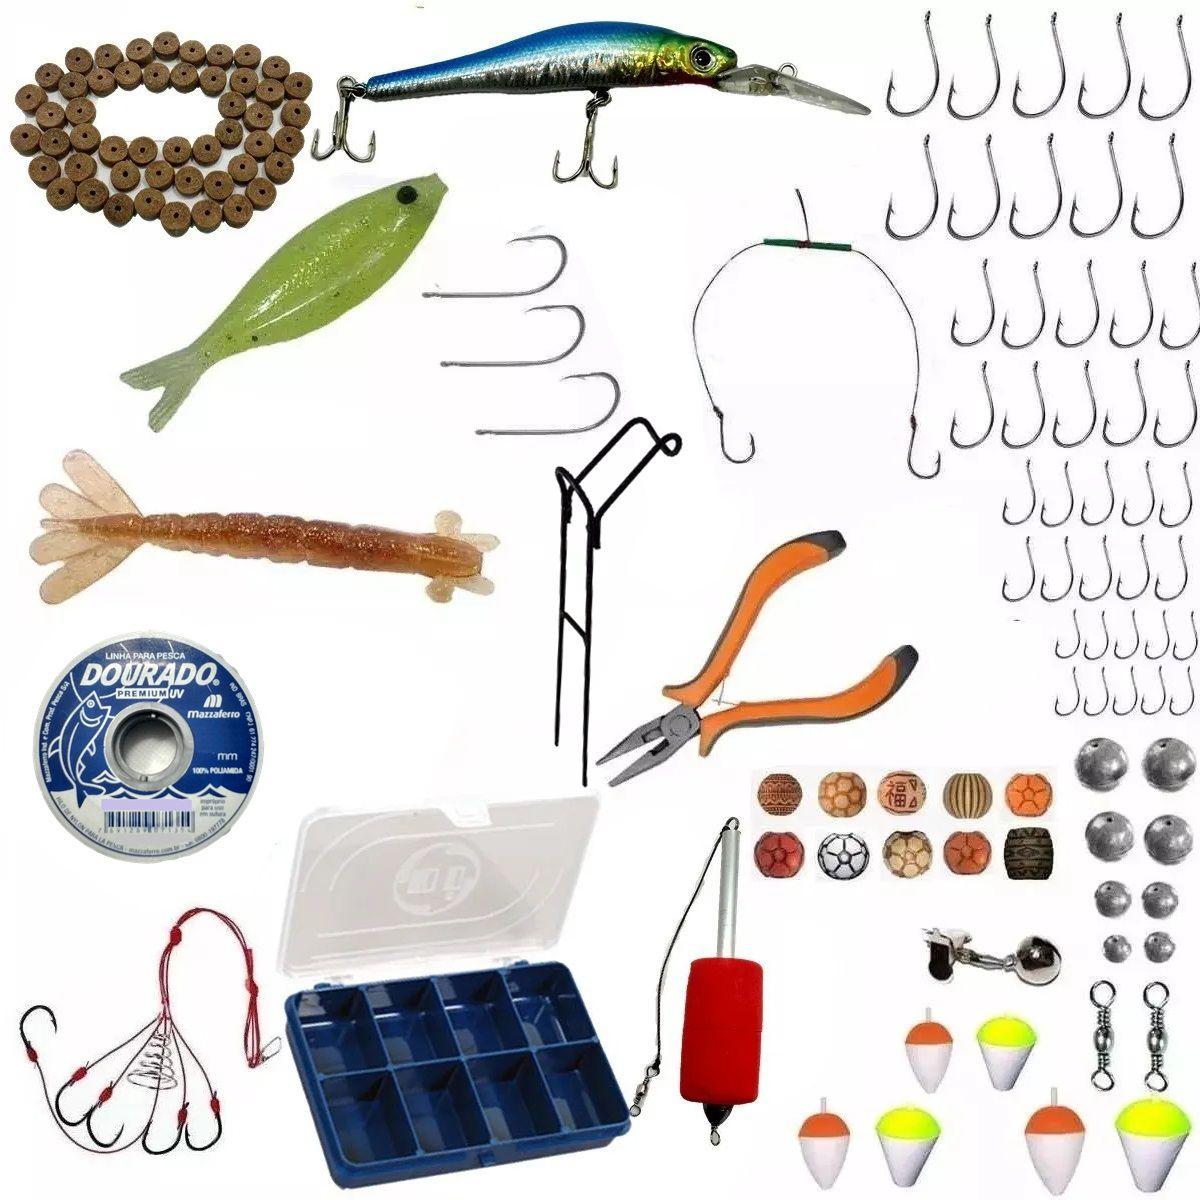 Acessórios De Pesca Completo Kit Pronto Para Varios Locais